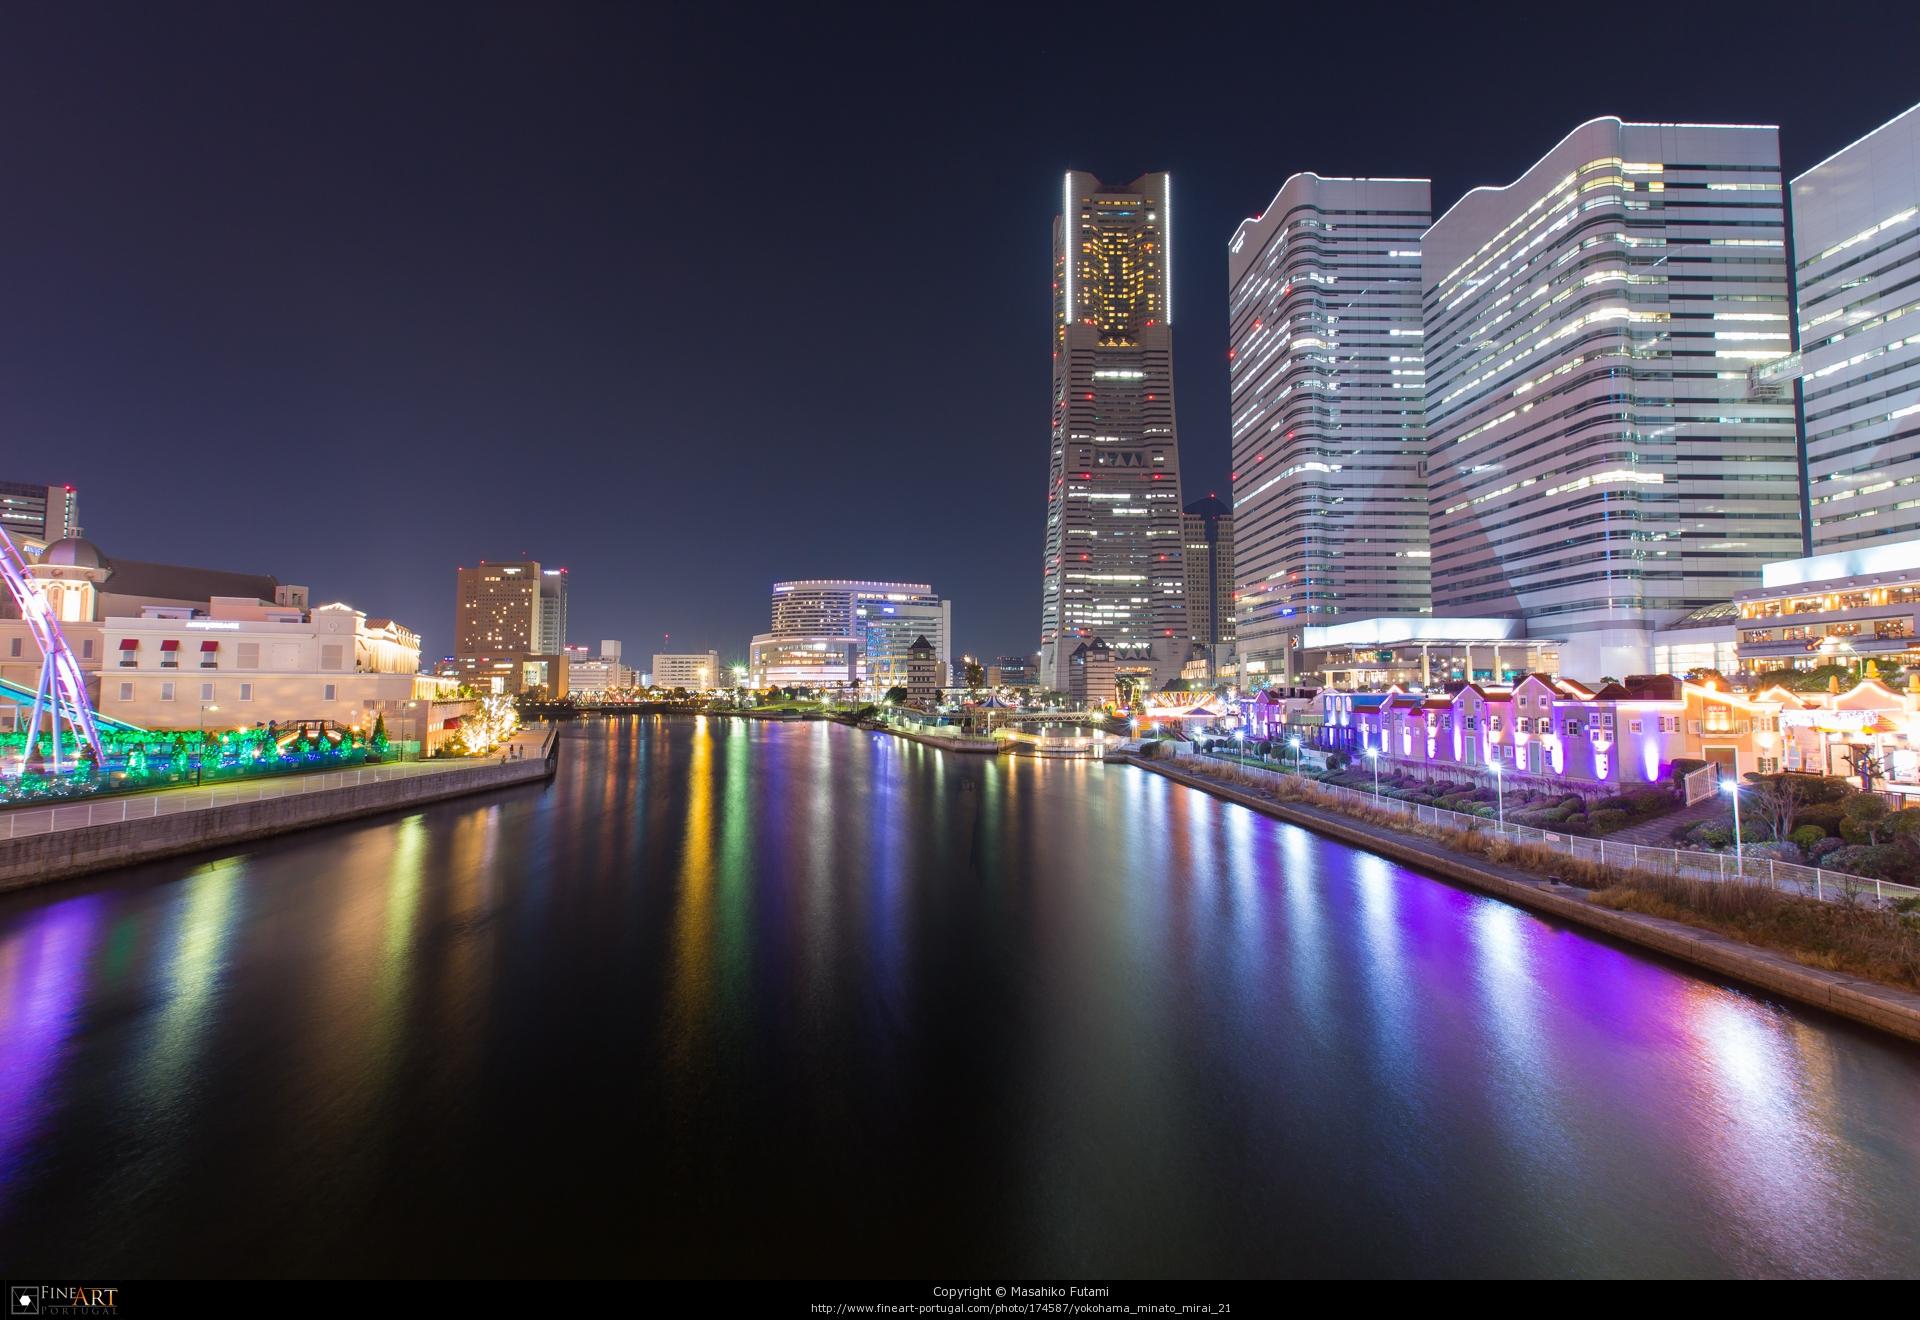 FineArt-Portugal掲載作品 No.4 『Yokohama Minato Mirai 21』